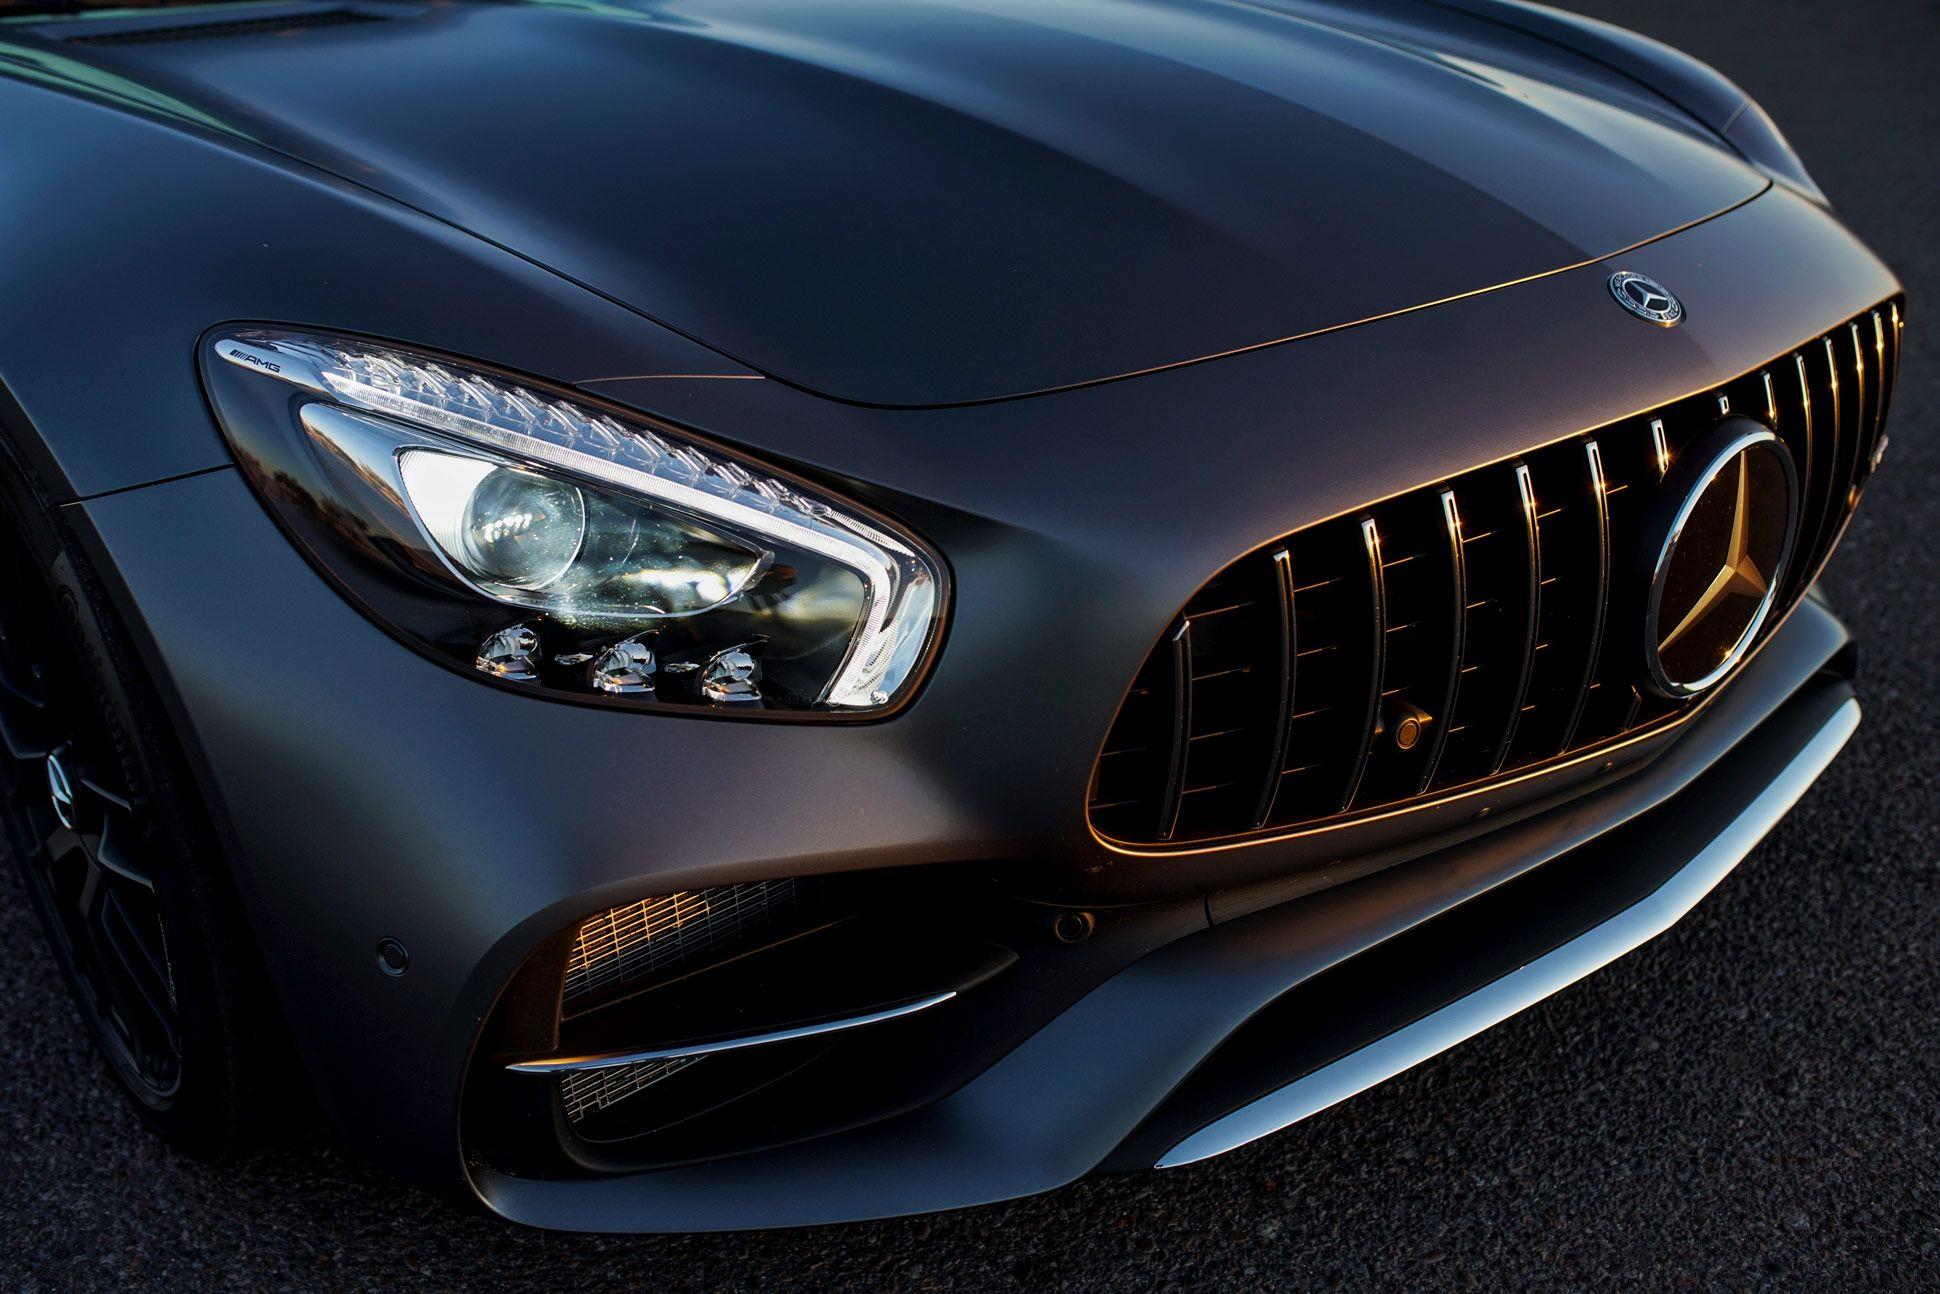 Mercedes-Benz-AMG-GT-C-Gear-Patrol-Ambiance-Slide-4